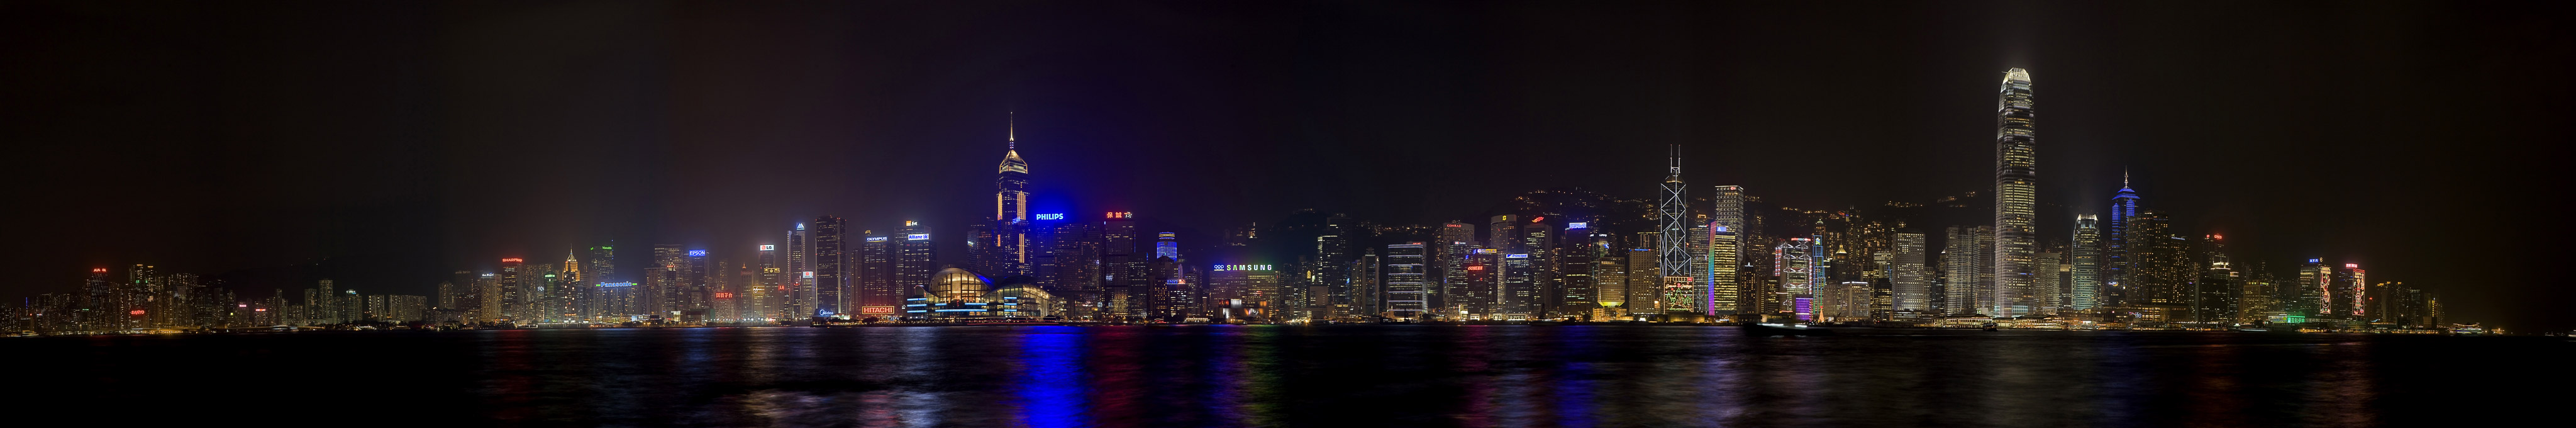 (©) Bernd Beisel - HongKong, Chinesische Sonderverwaltungszone